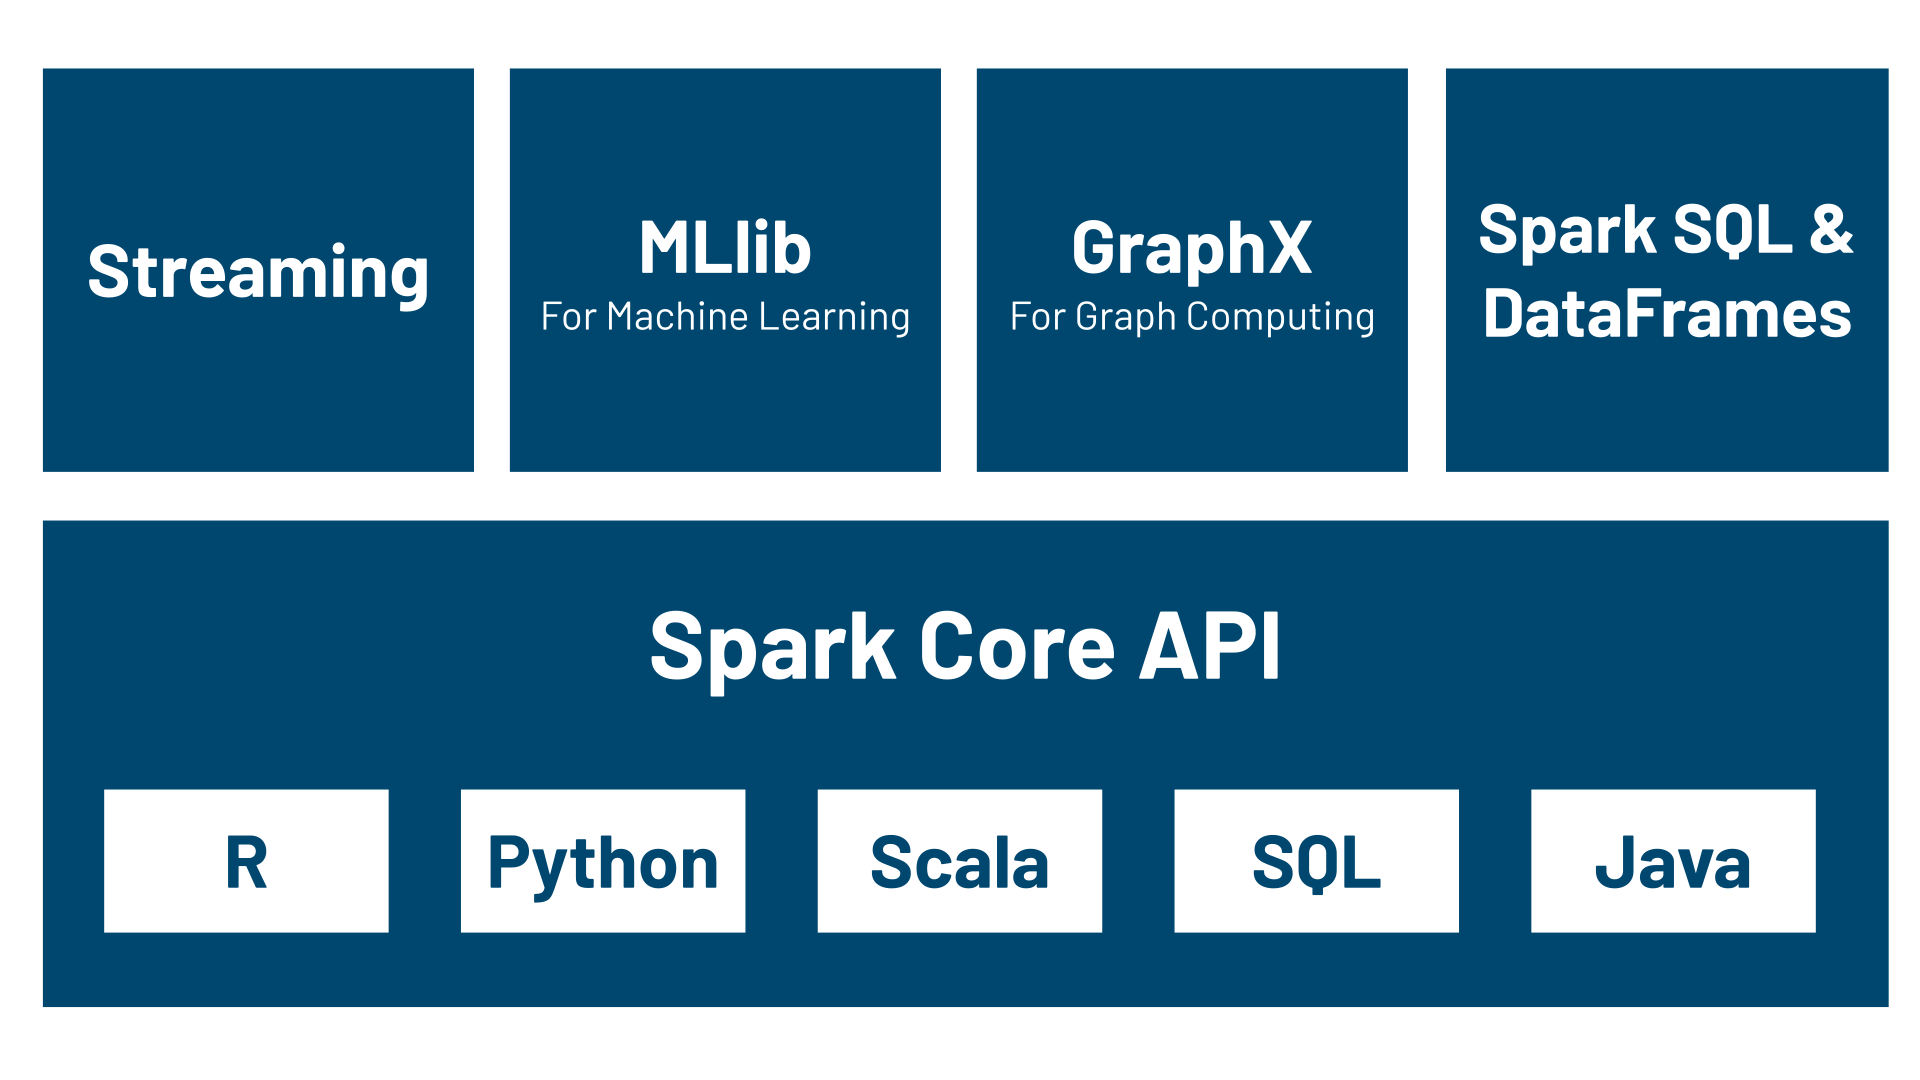 Apache Spark Ecosystem: Streaming, MLlib, GraphX, SparkSQL & Dataframes, Spark Core API.